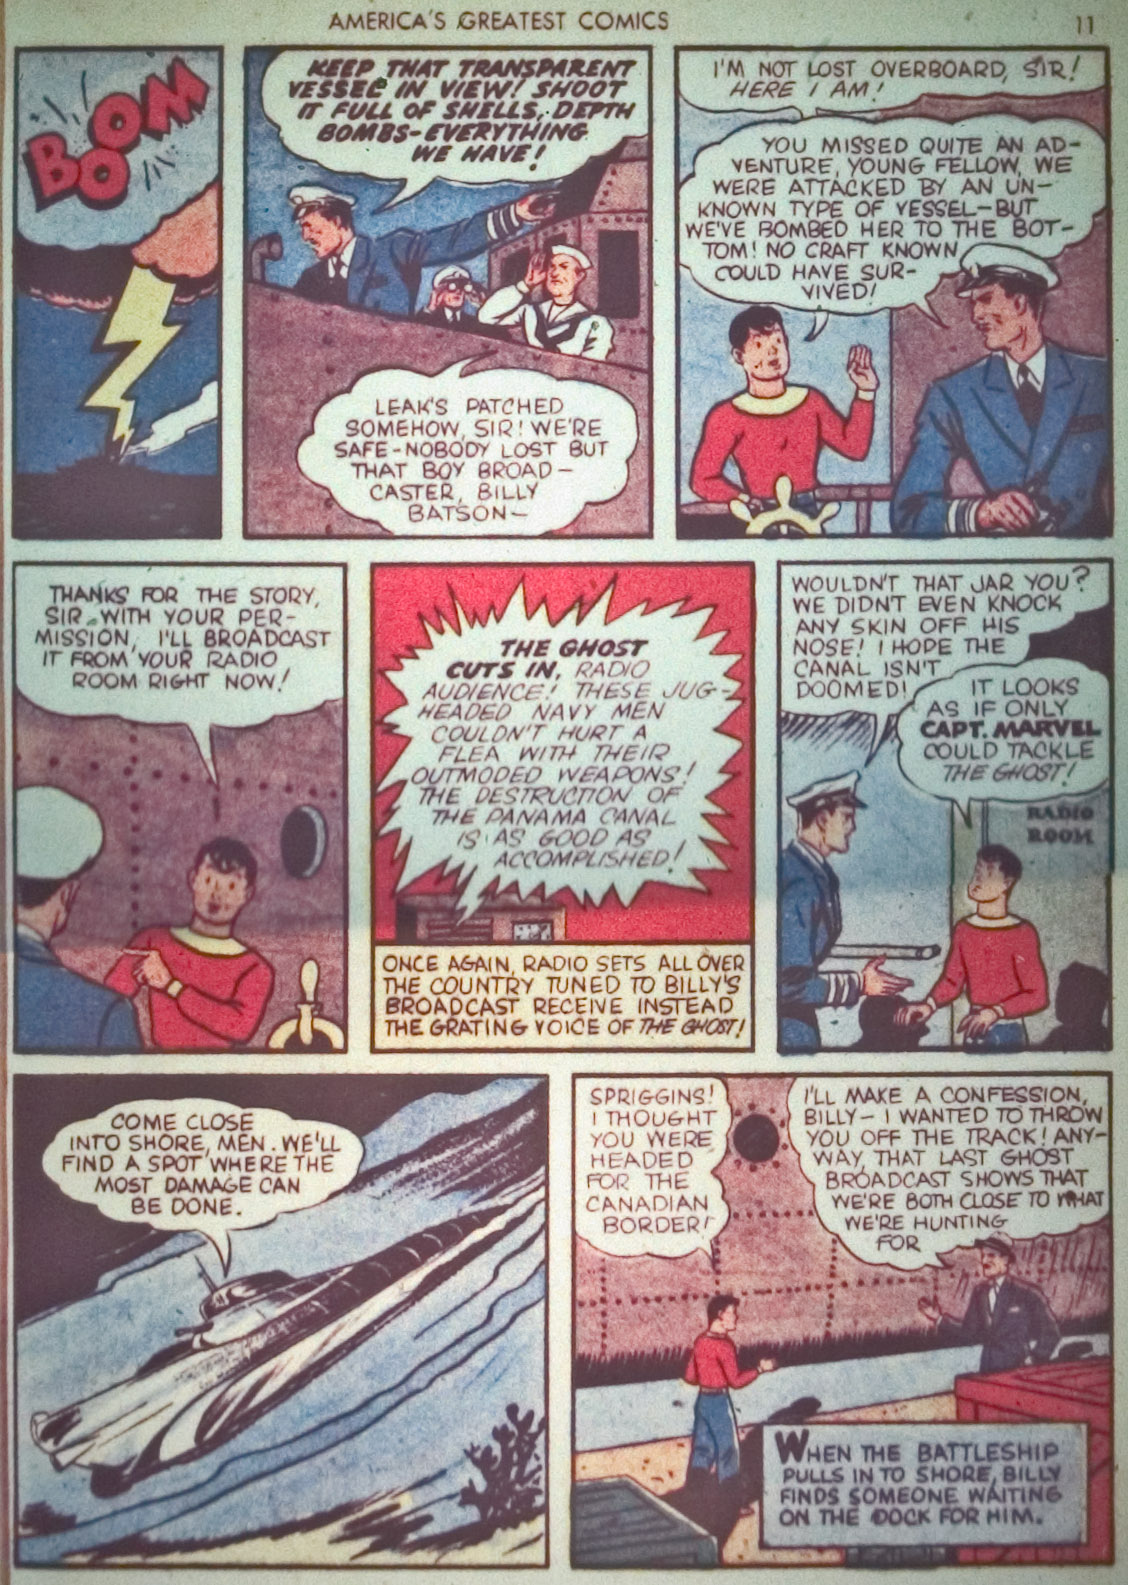 Read online America's Greatest Comics comic -  Issue #1 - 14